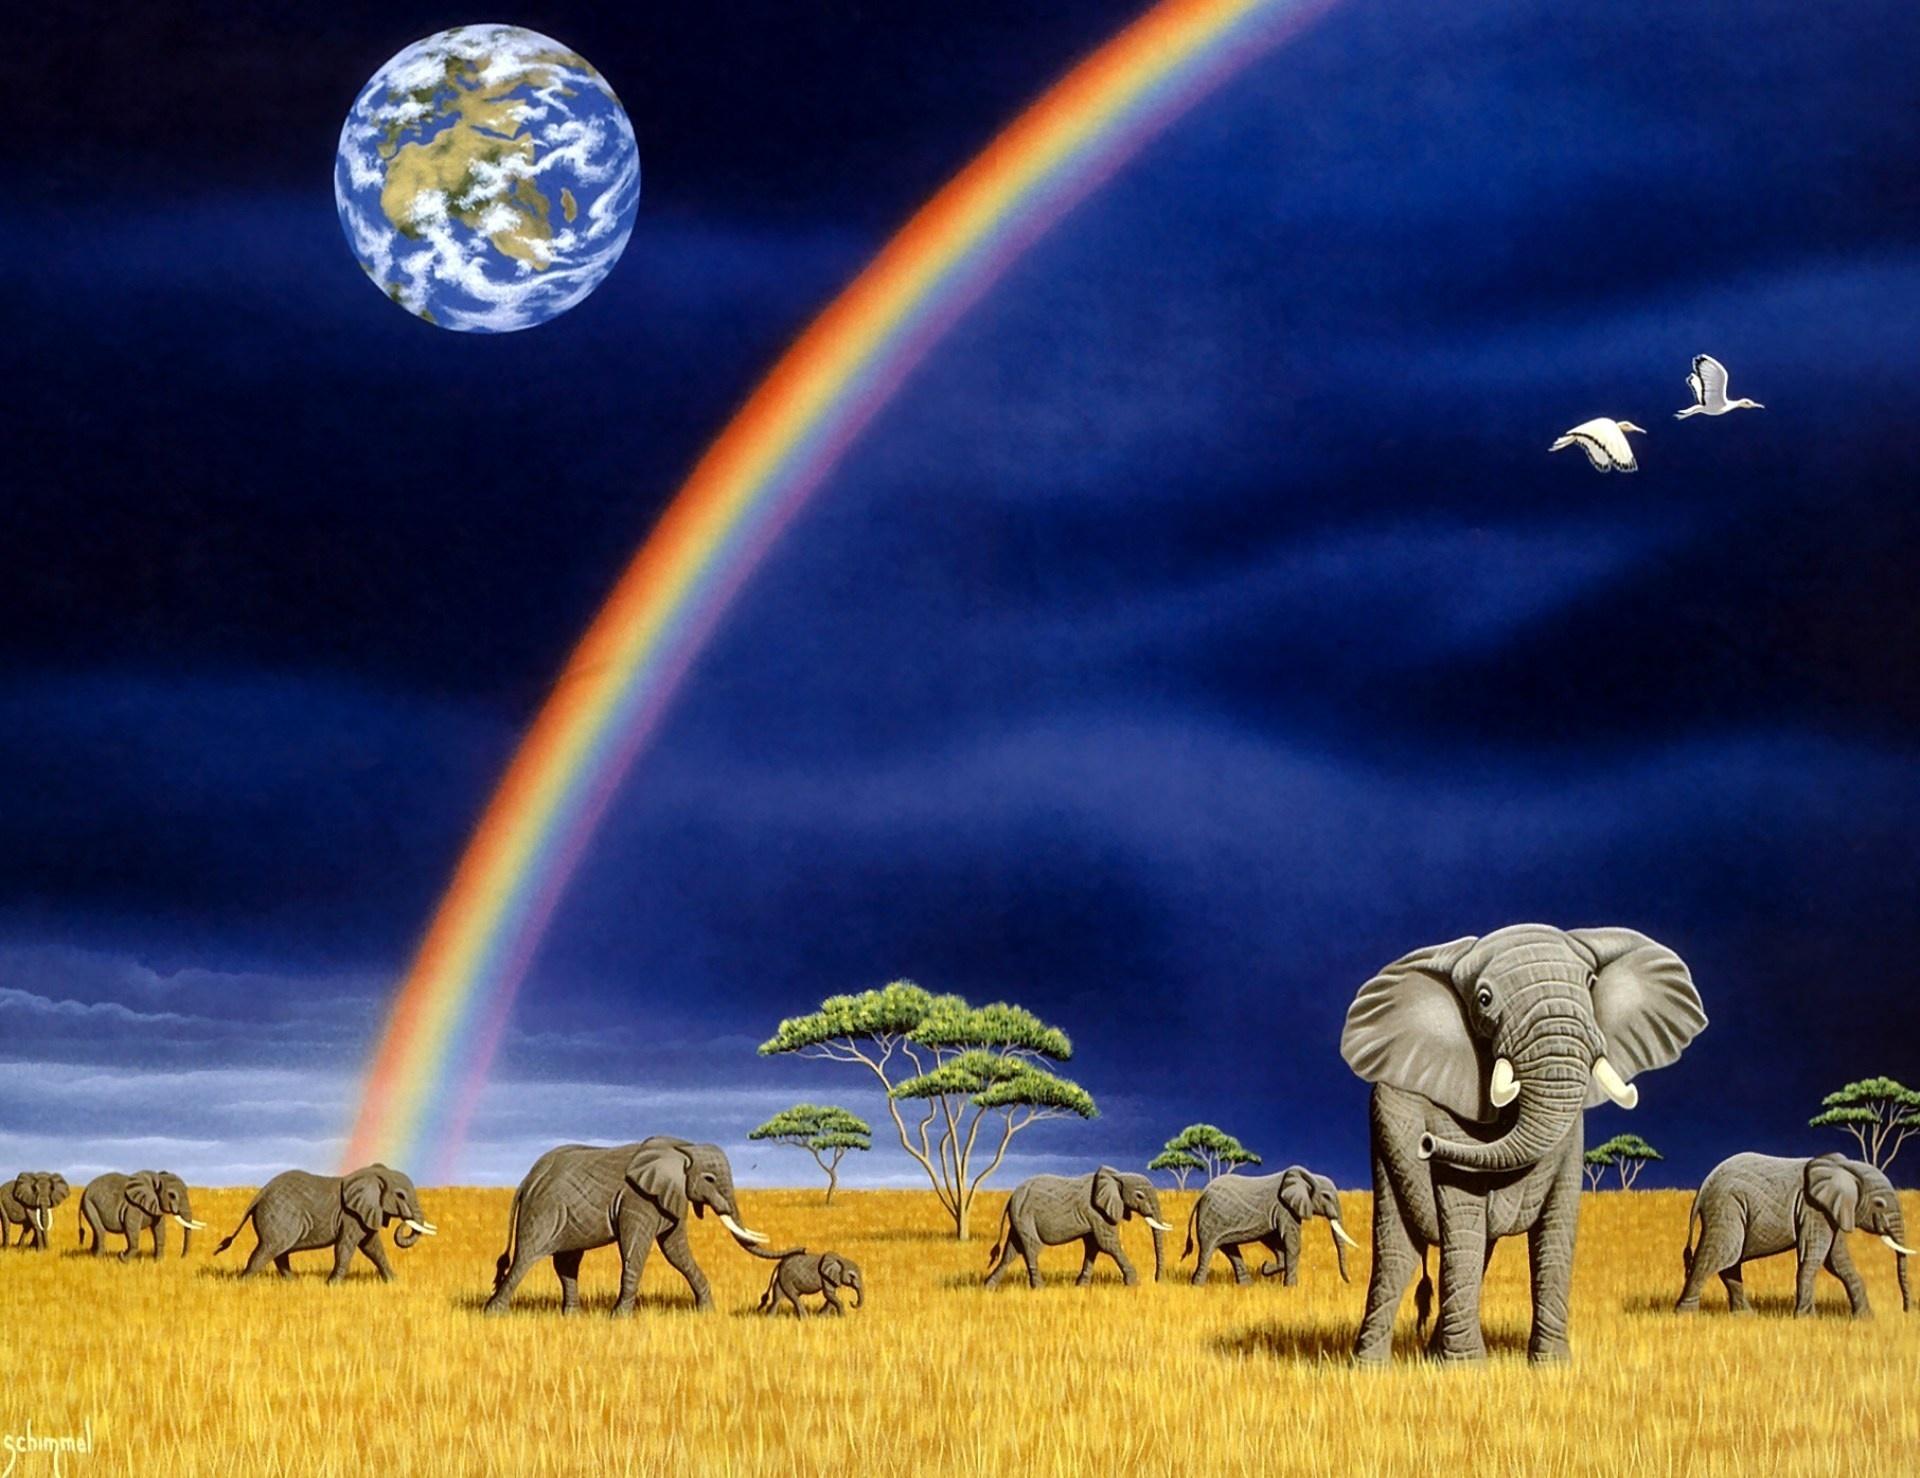 Hd wallpaper elephant - Animal Elephant Wallpaper